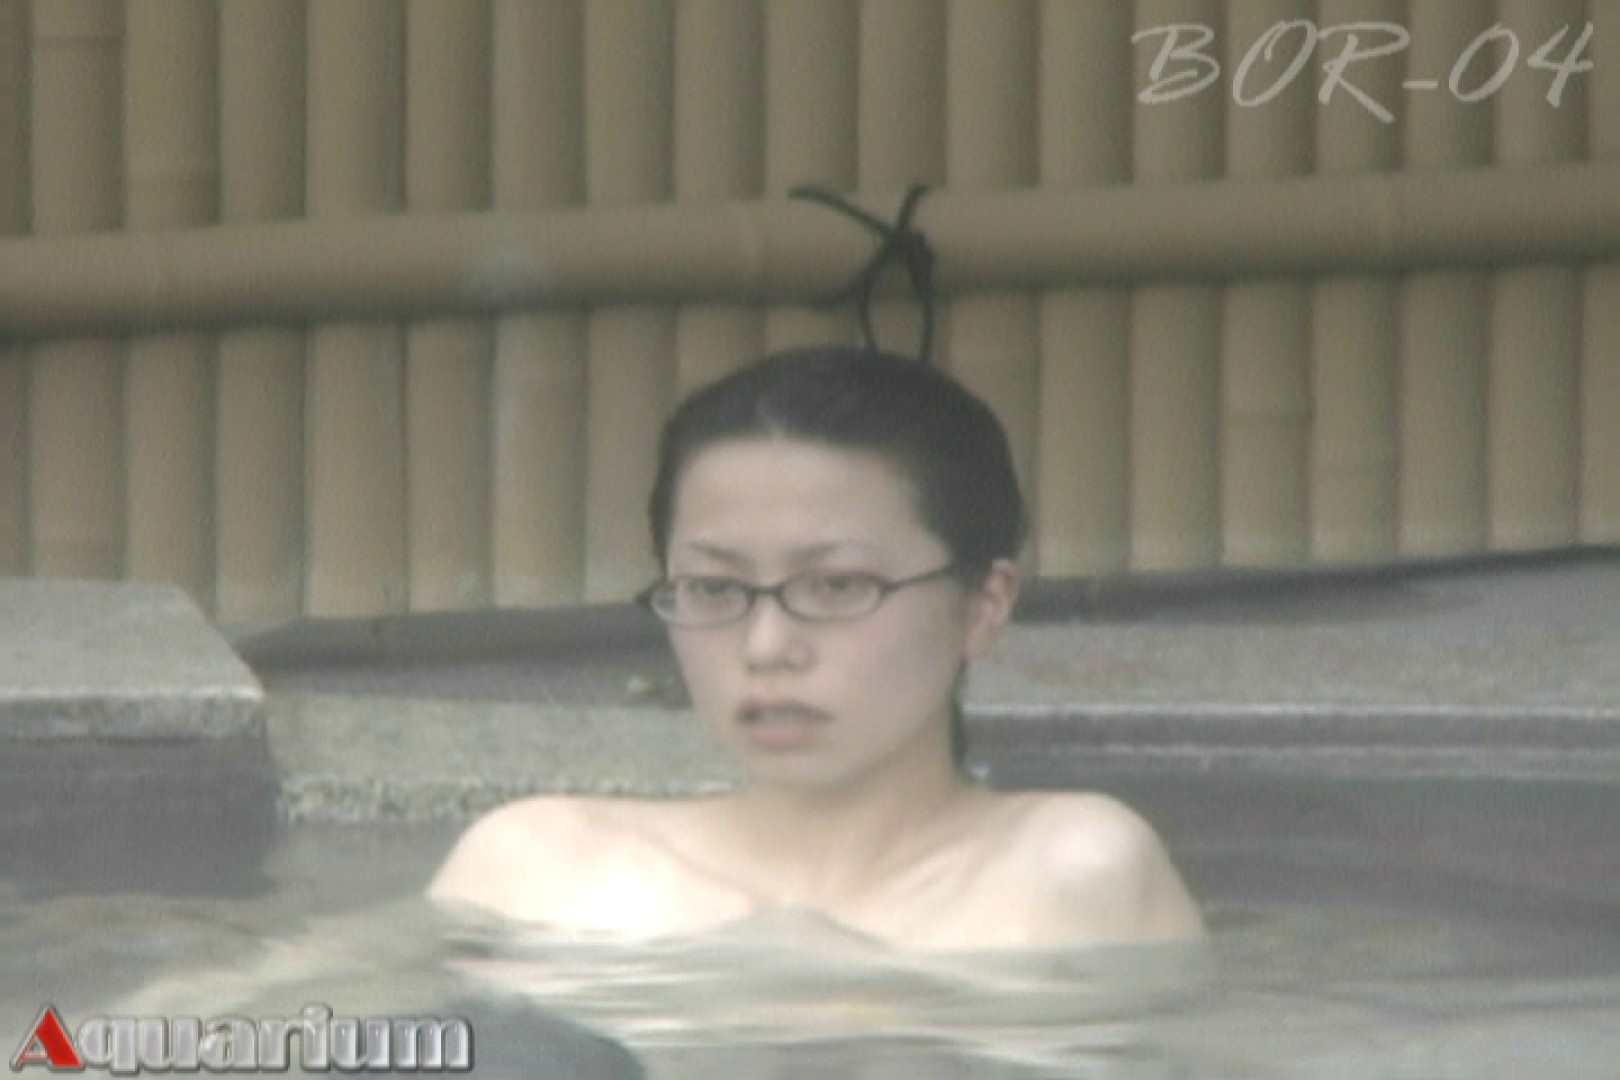 Aquaな露天風呂Vol.504 露天 | OLのプライベート  13pic 10